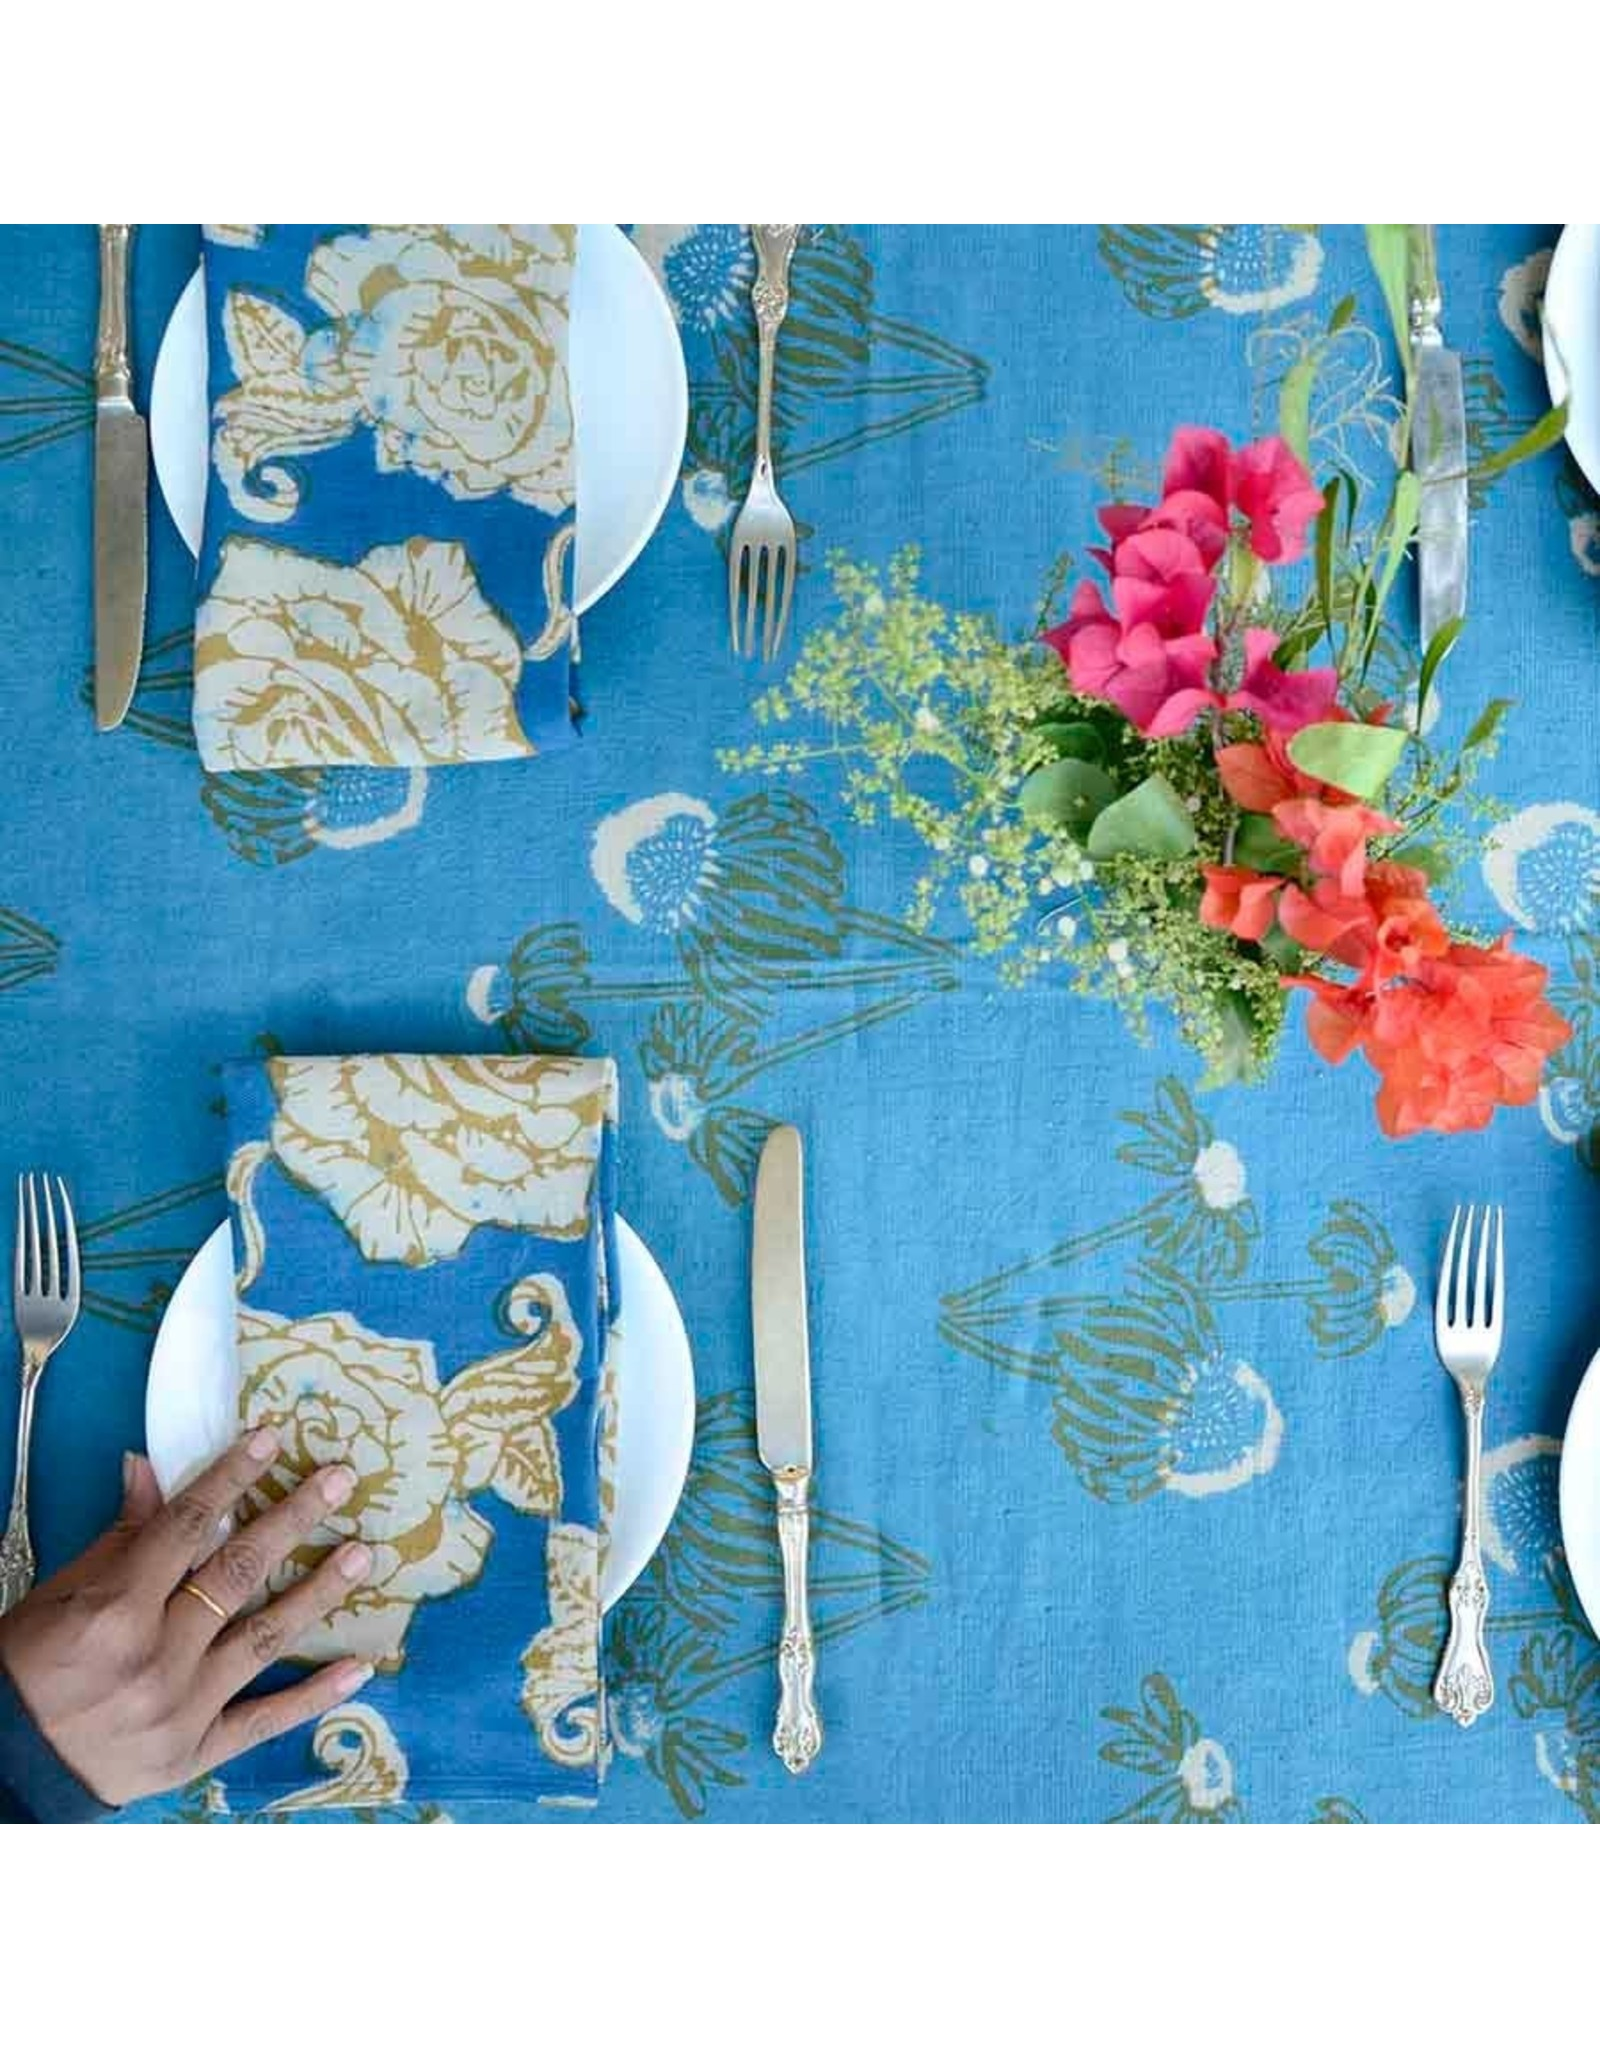 "Ichcha 20"" x 20"" 100% Cotton Blue & Gold Floral Napkins Set of 4"